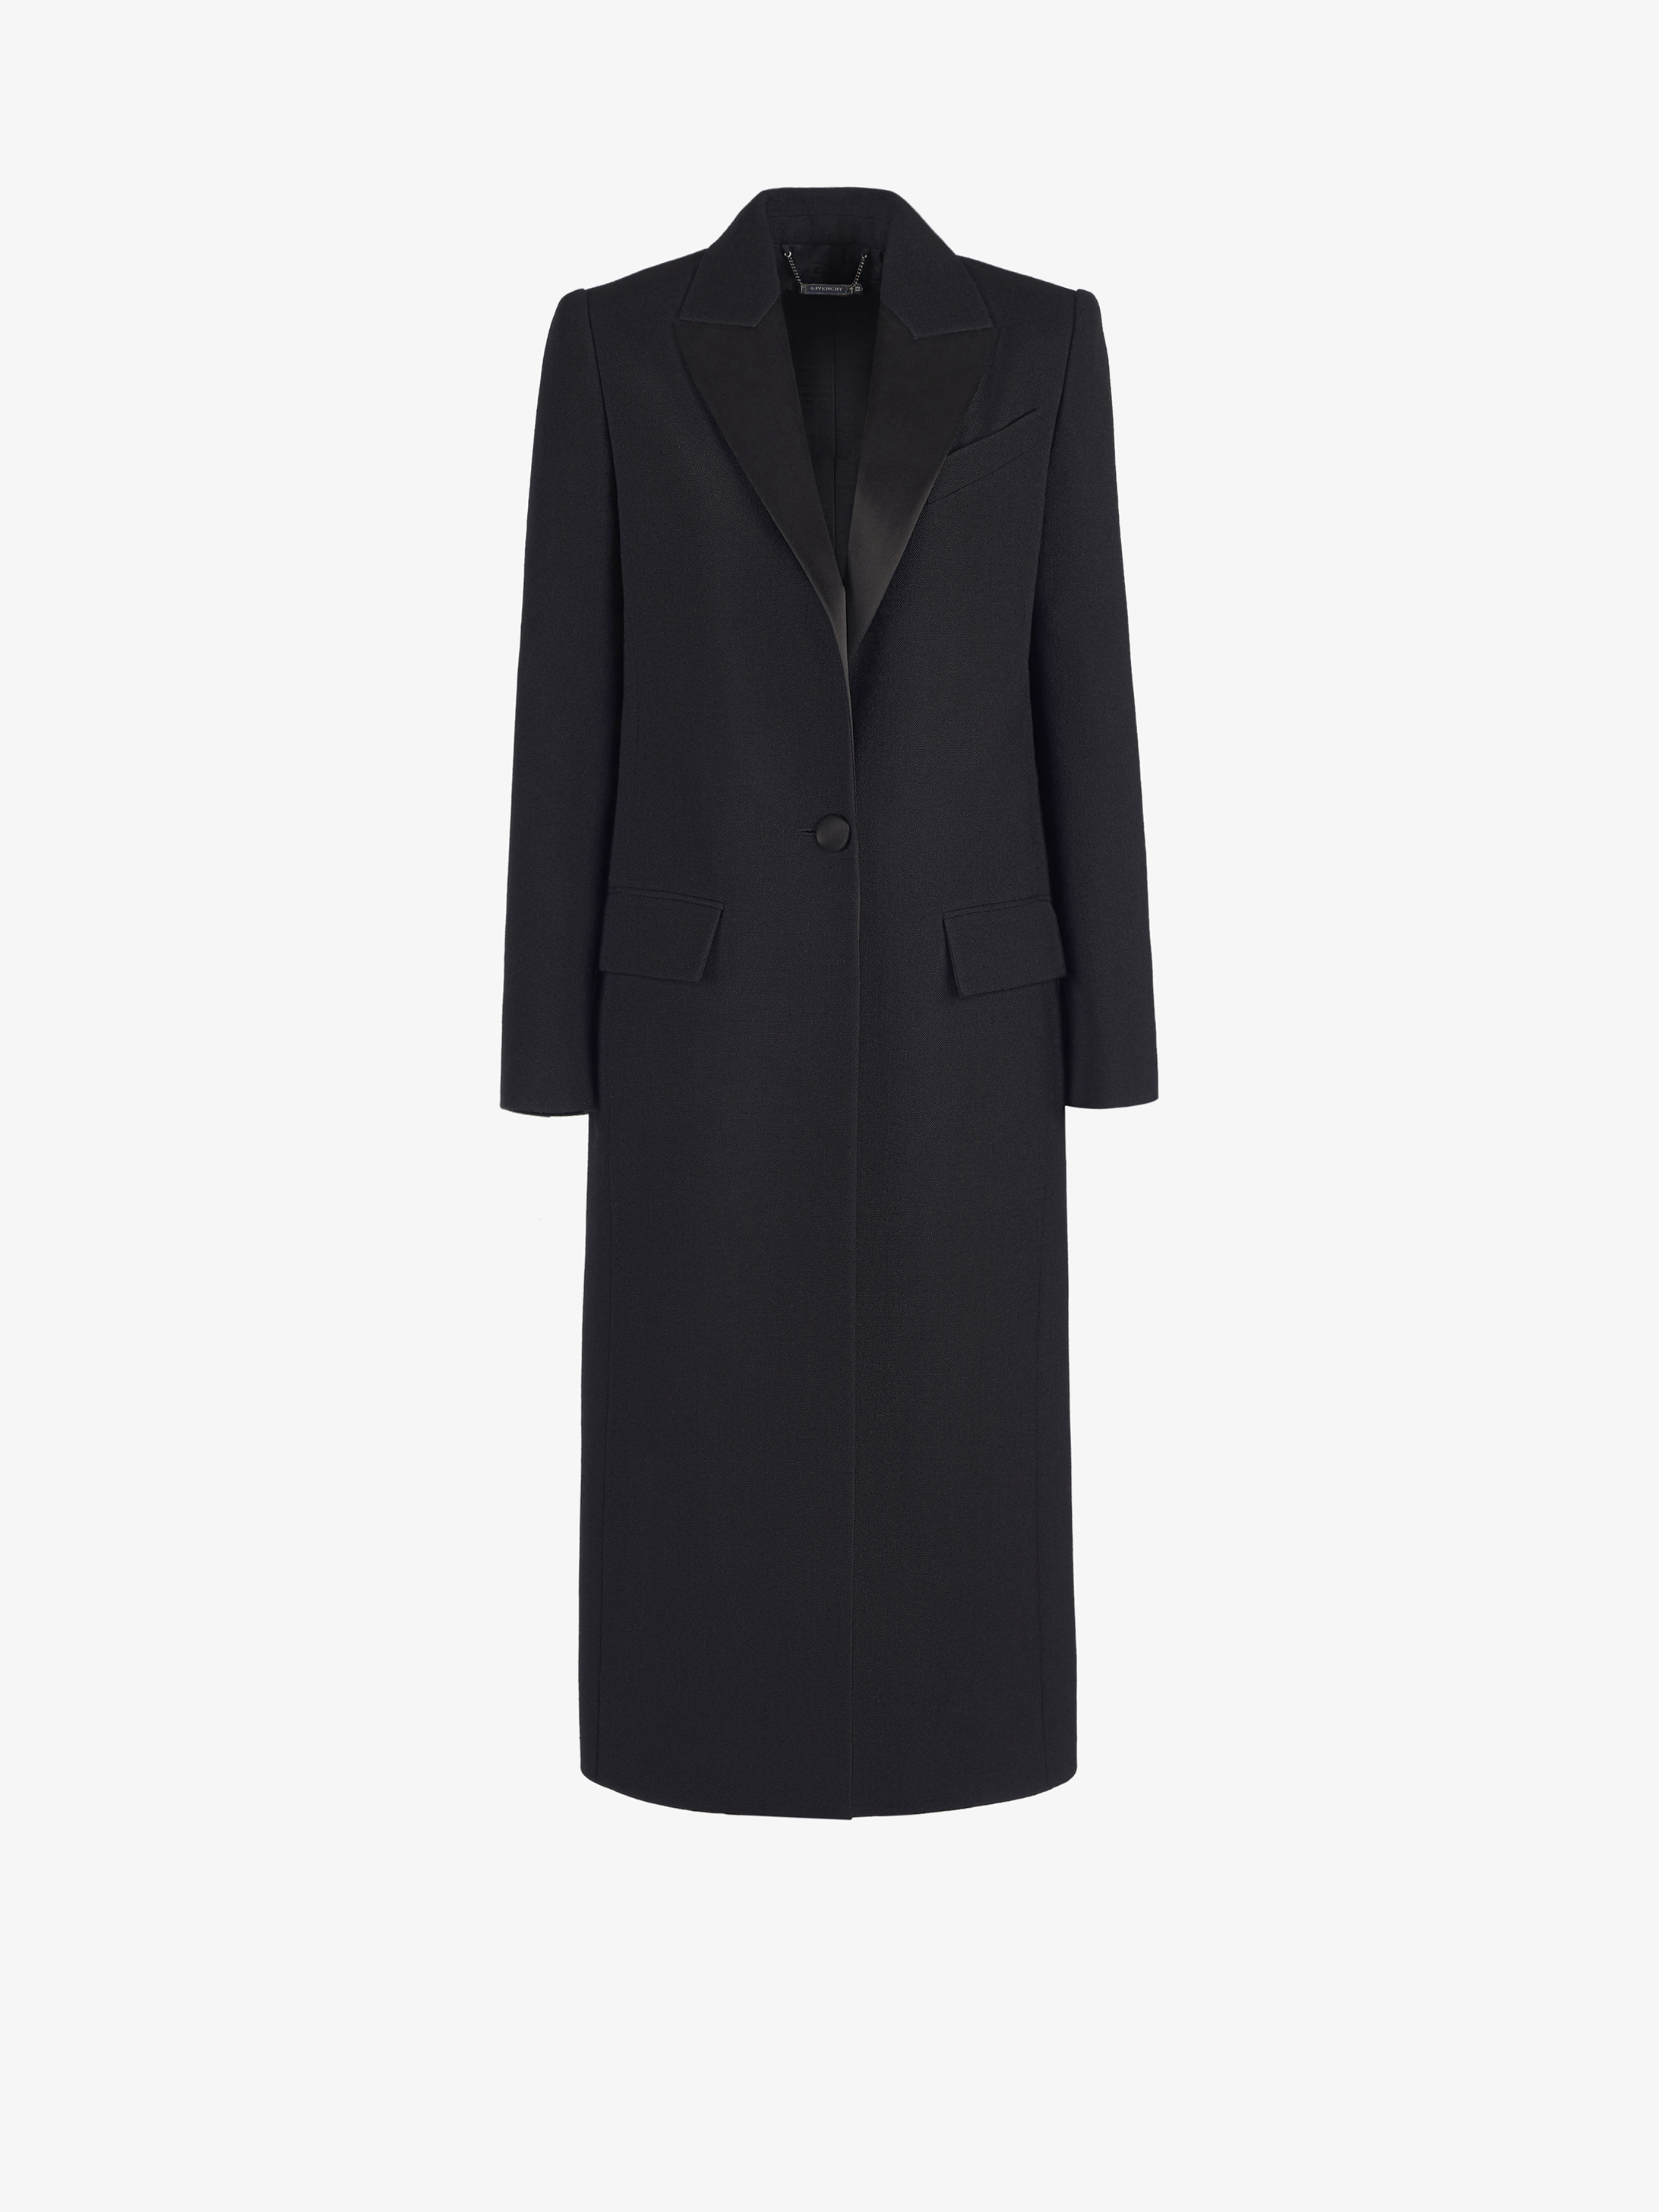 Single breasted long tuxedo coat